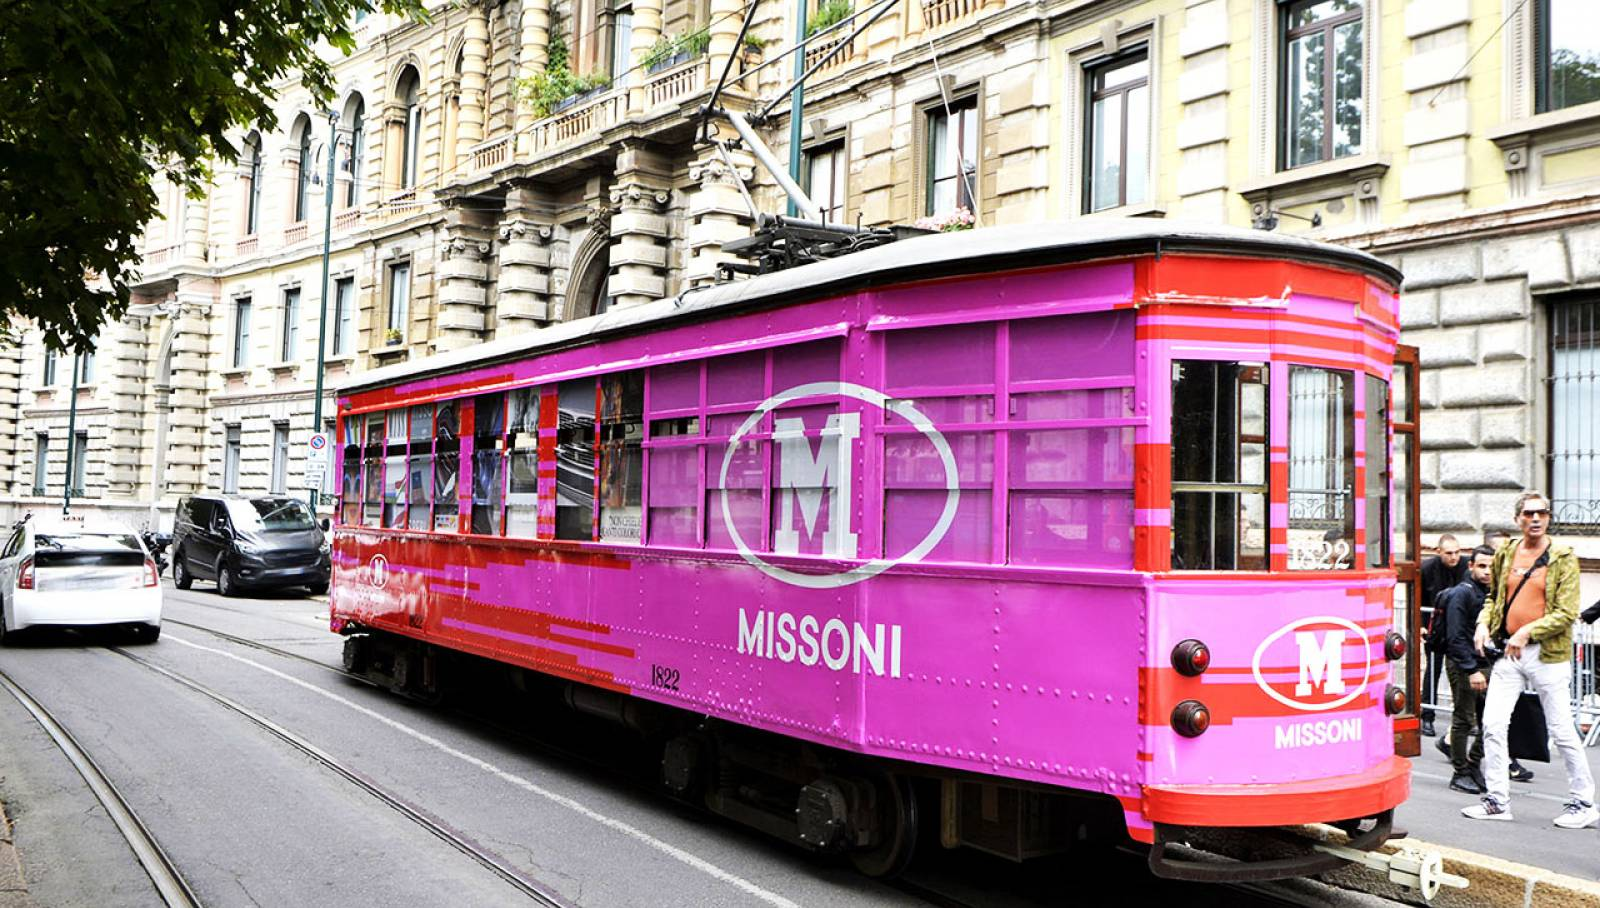 Advertising on tram IGPDecaux Milan tram for M Missoni